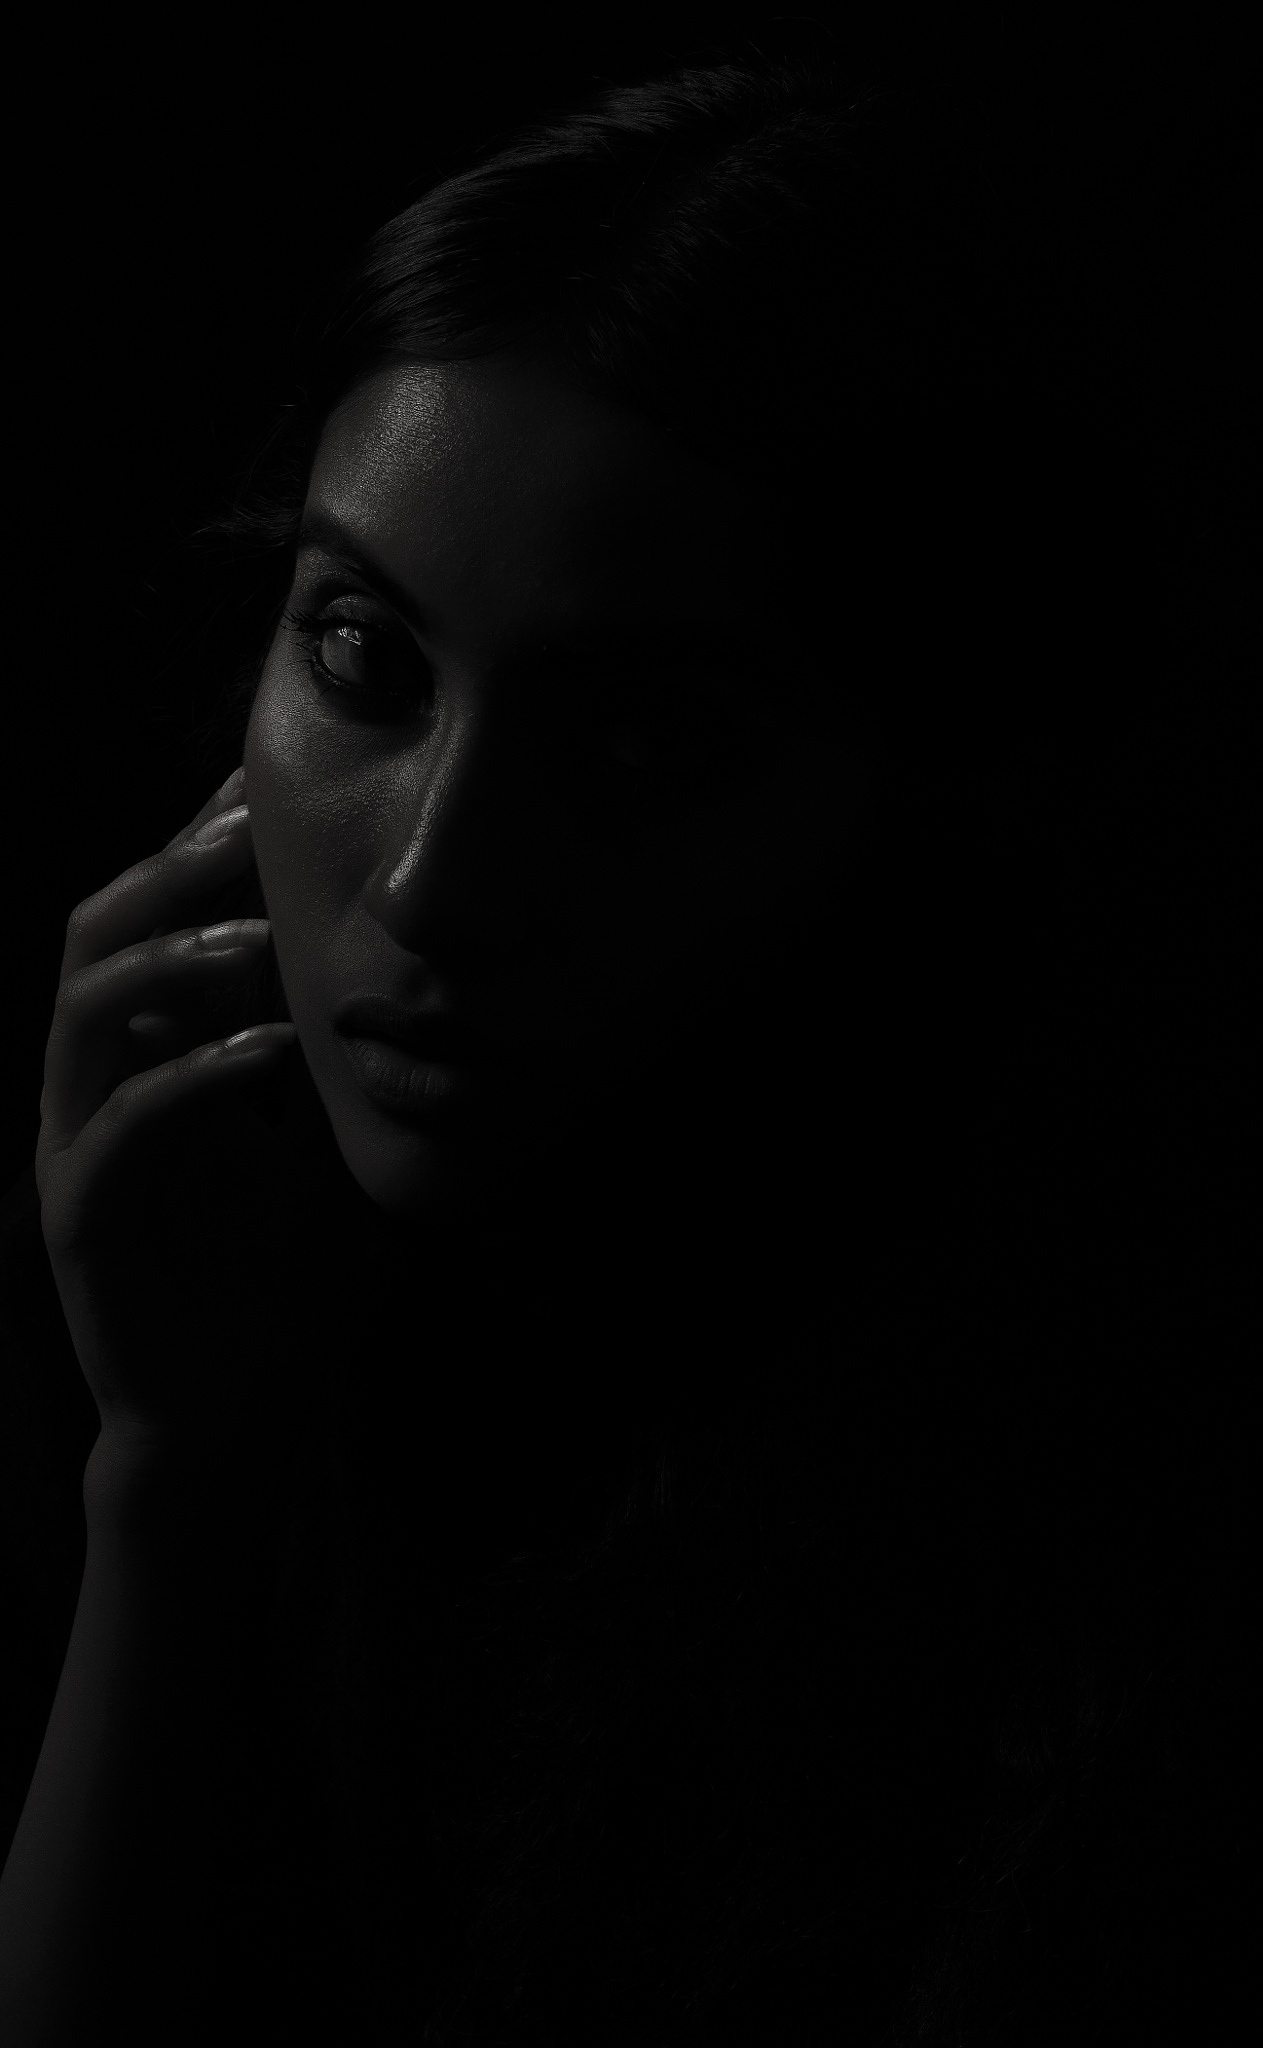 Dark beauty  by shourov hassan